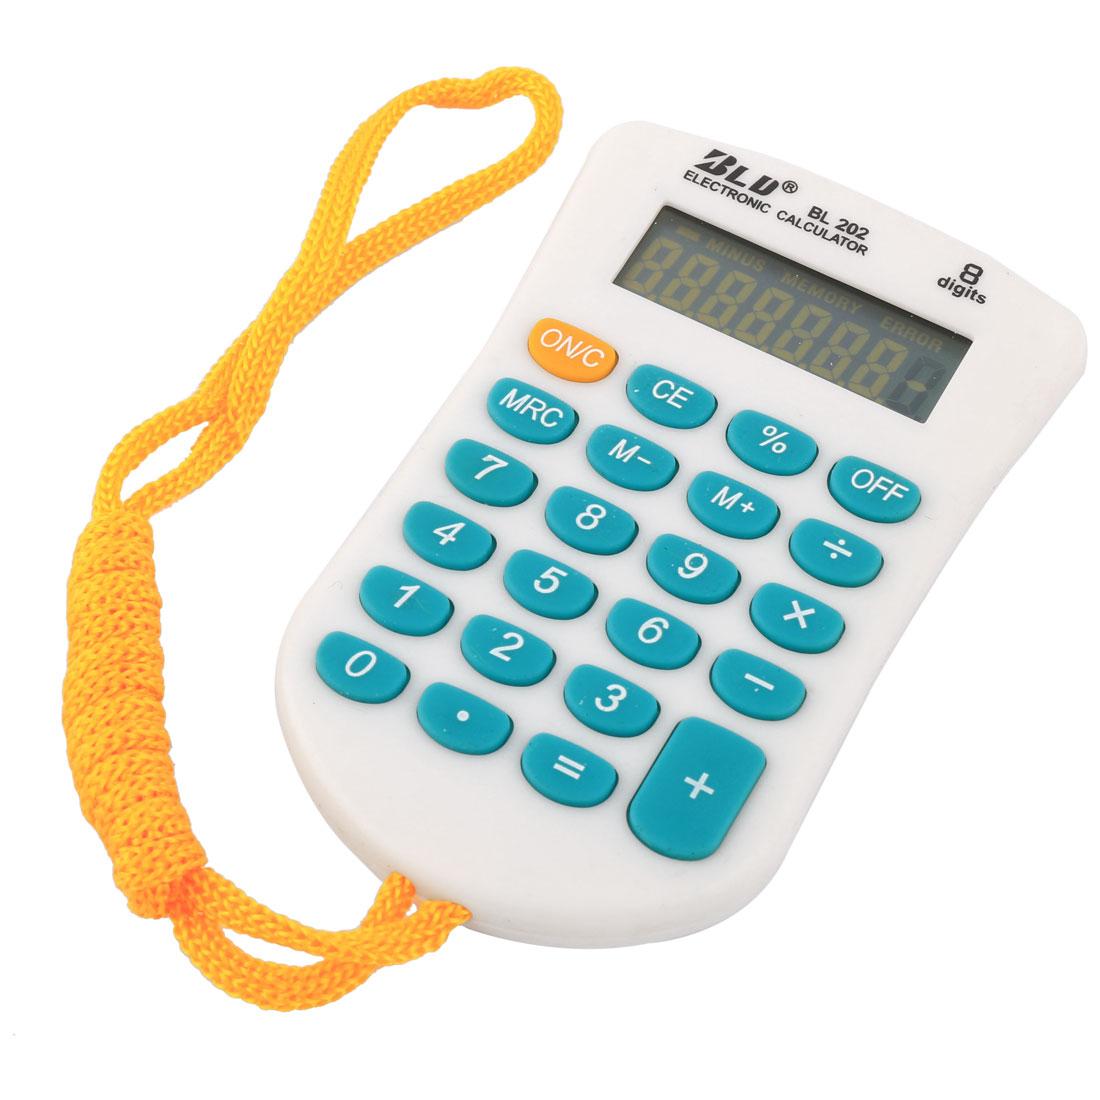 School Home Study Tool Desktop Pocket 8 Digits Electronic Scientific Calculator